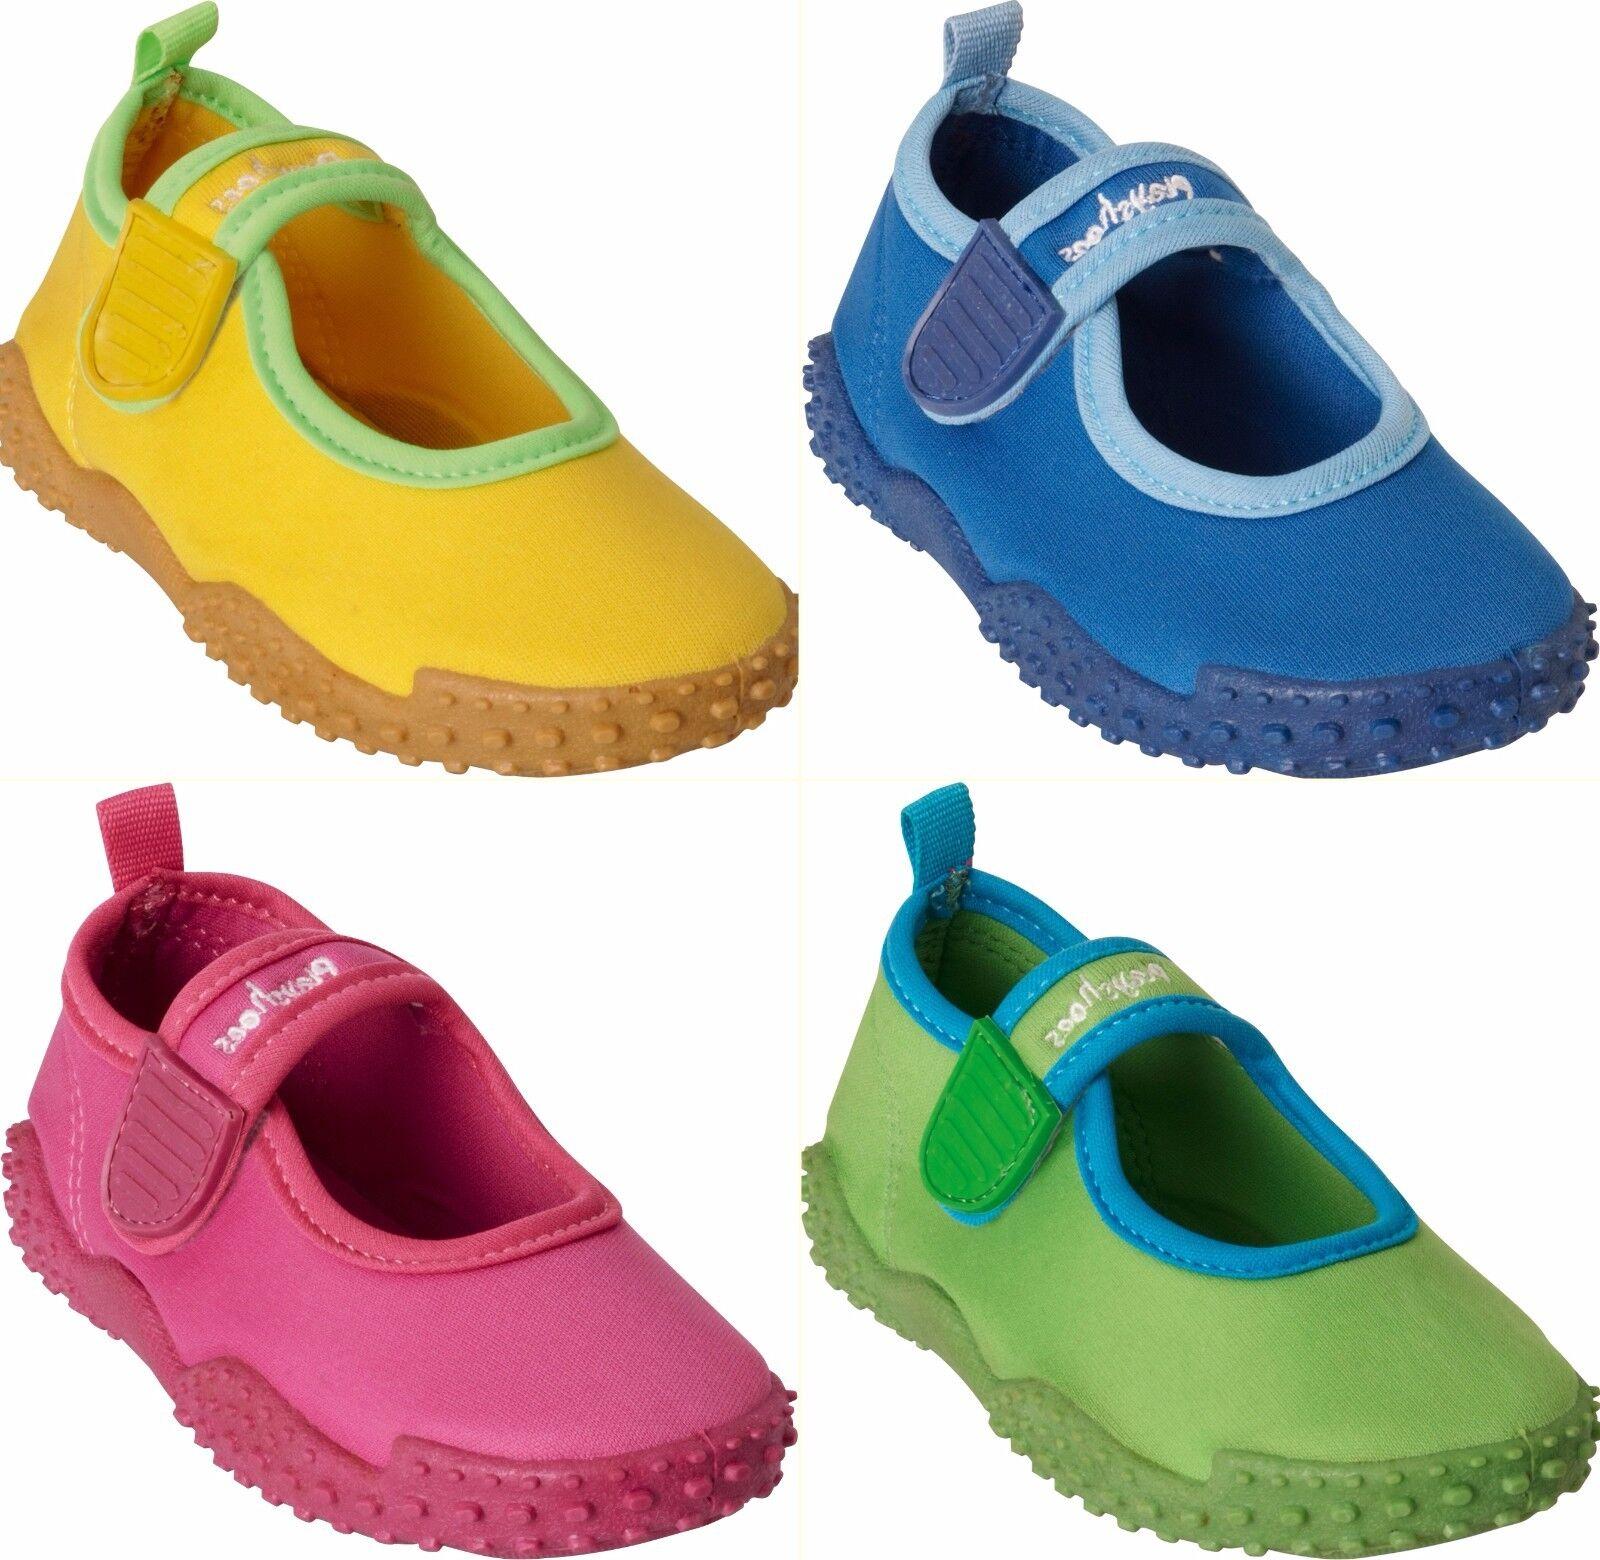 Playshoes Kinder Baby Badeschuhe Schuhe UV Schutz Mädchen Jungen Gr. 18 bis 35